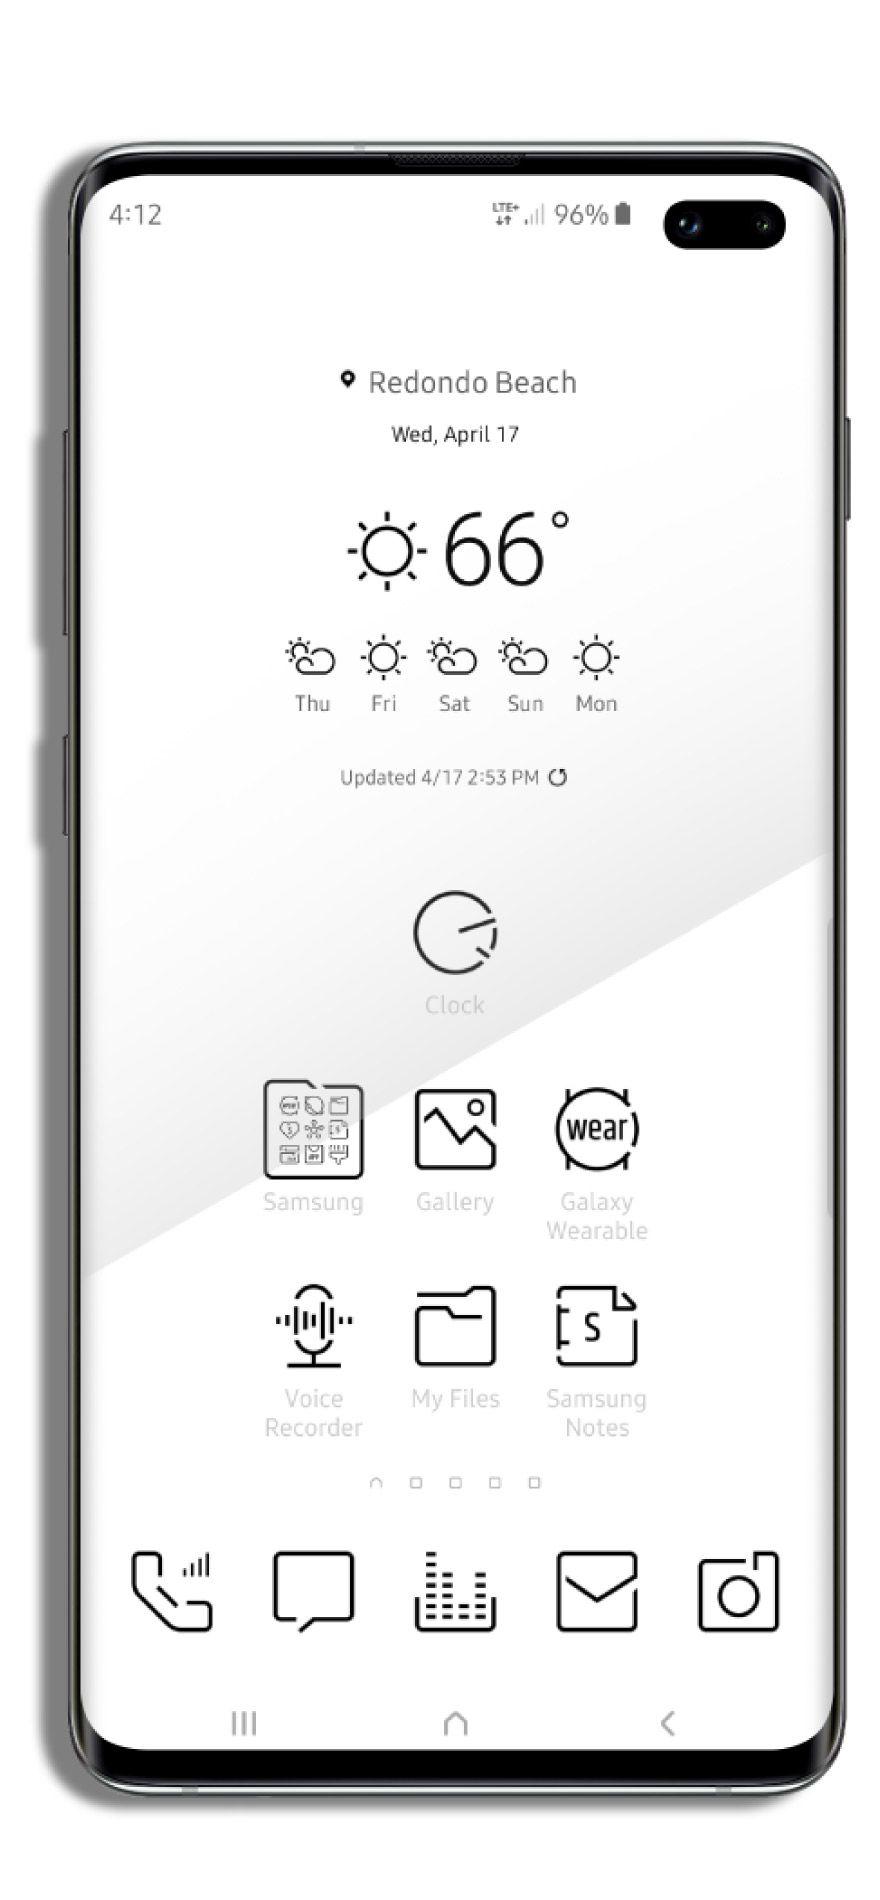 X9 Minimal White Samsung Mobile Phone Theme Samsung Galaxy Phones Phone Themes Themes For Mobile